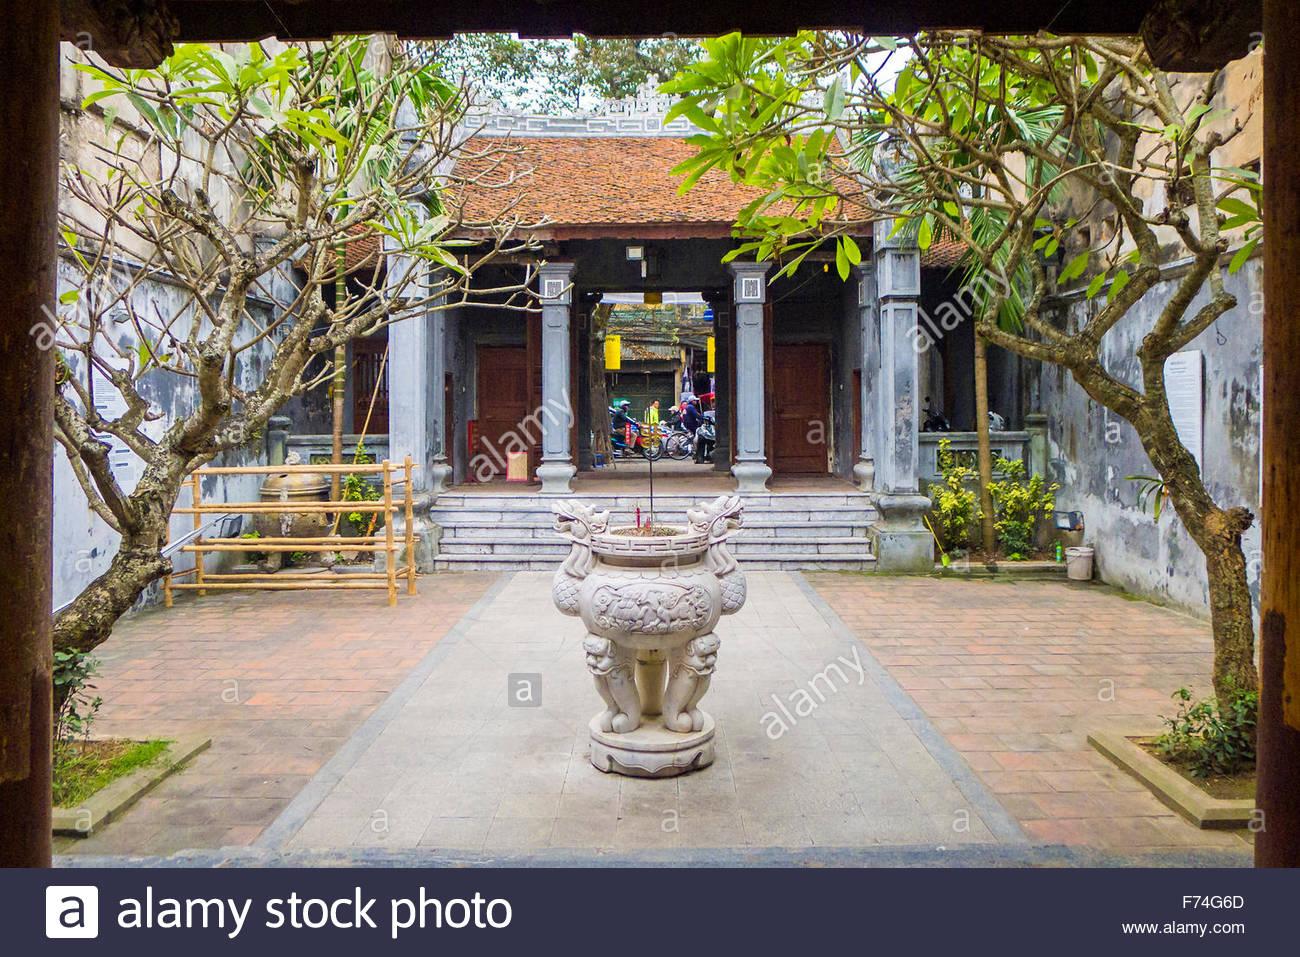 Small temple in Old Quarter, Hoan Kiem District, Hanoi, Vietnam, Hanoi, Vietnam - Stock Image